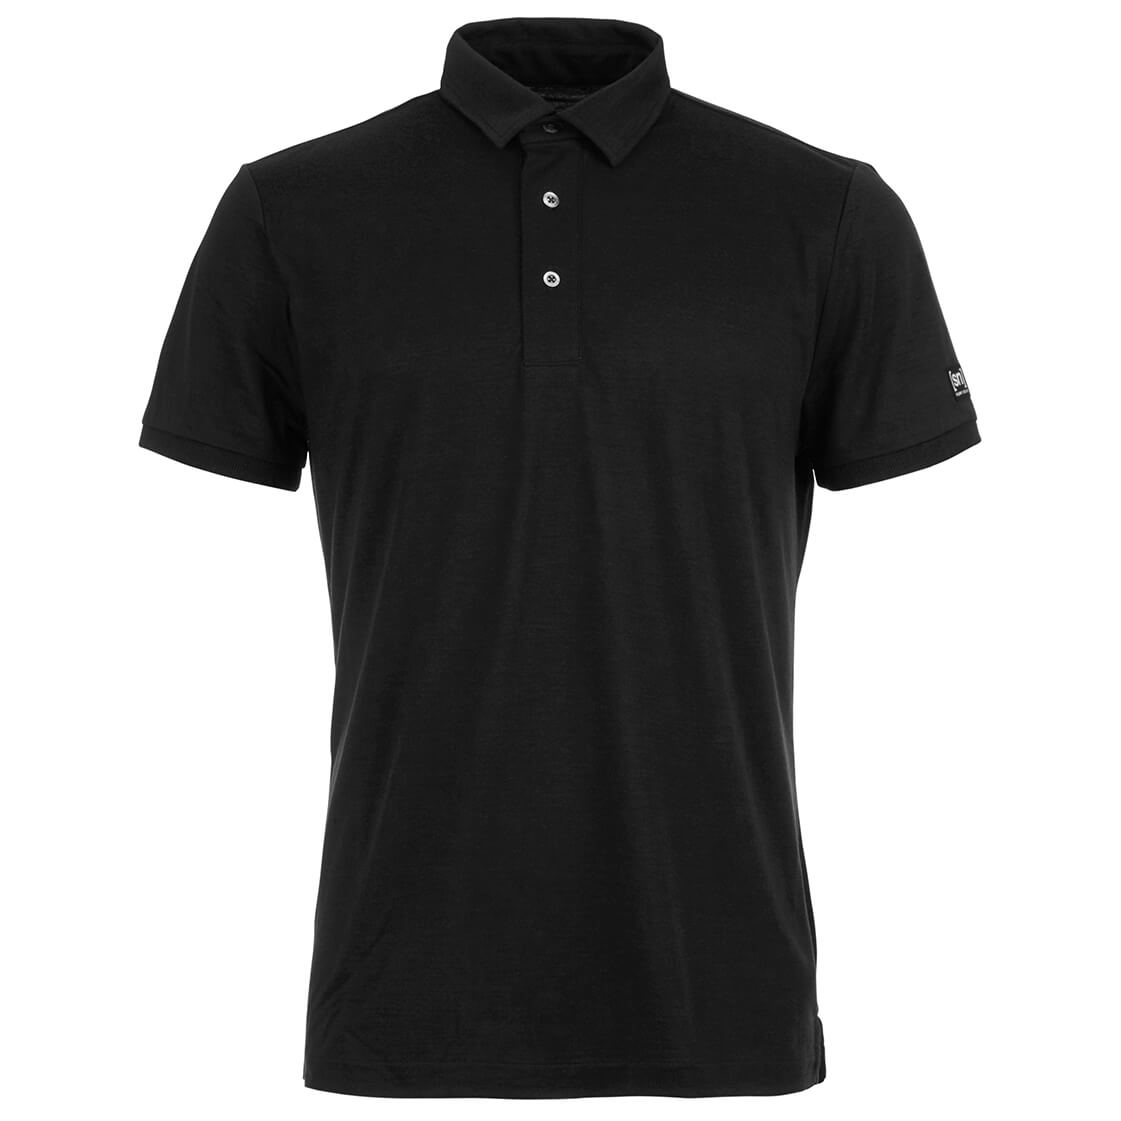 3512f8942af7c9 SuperNatural Essential Polo - Polo-Shirt Herren online kaufen ...